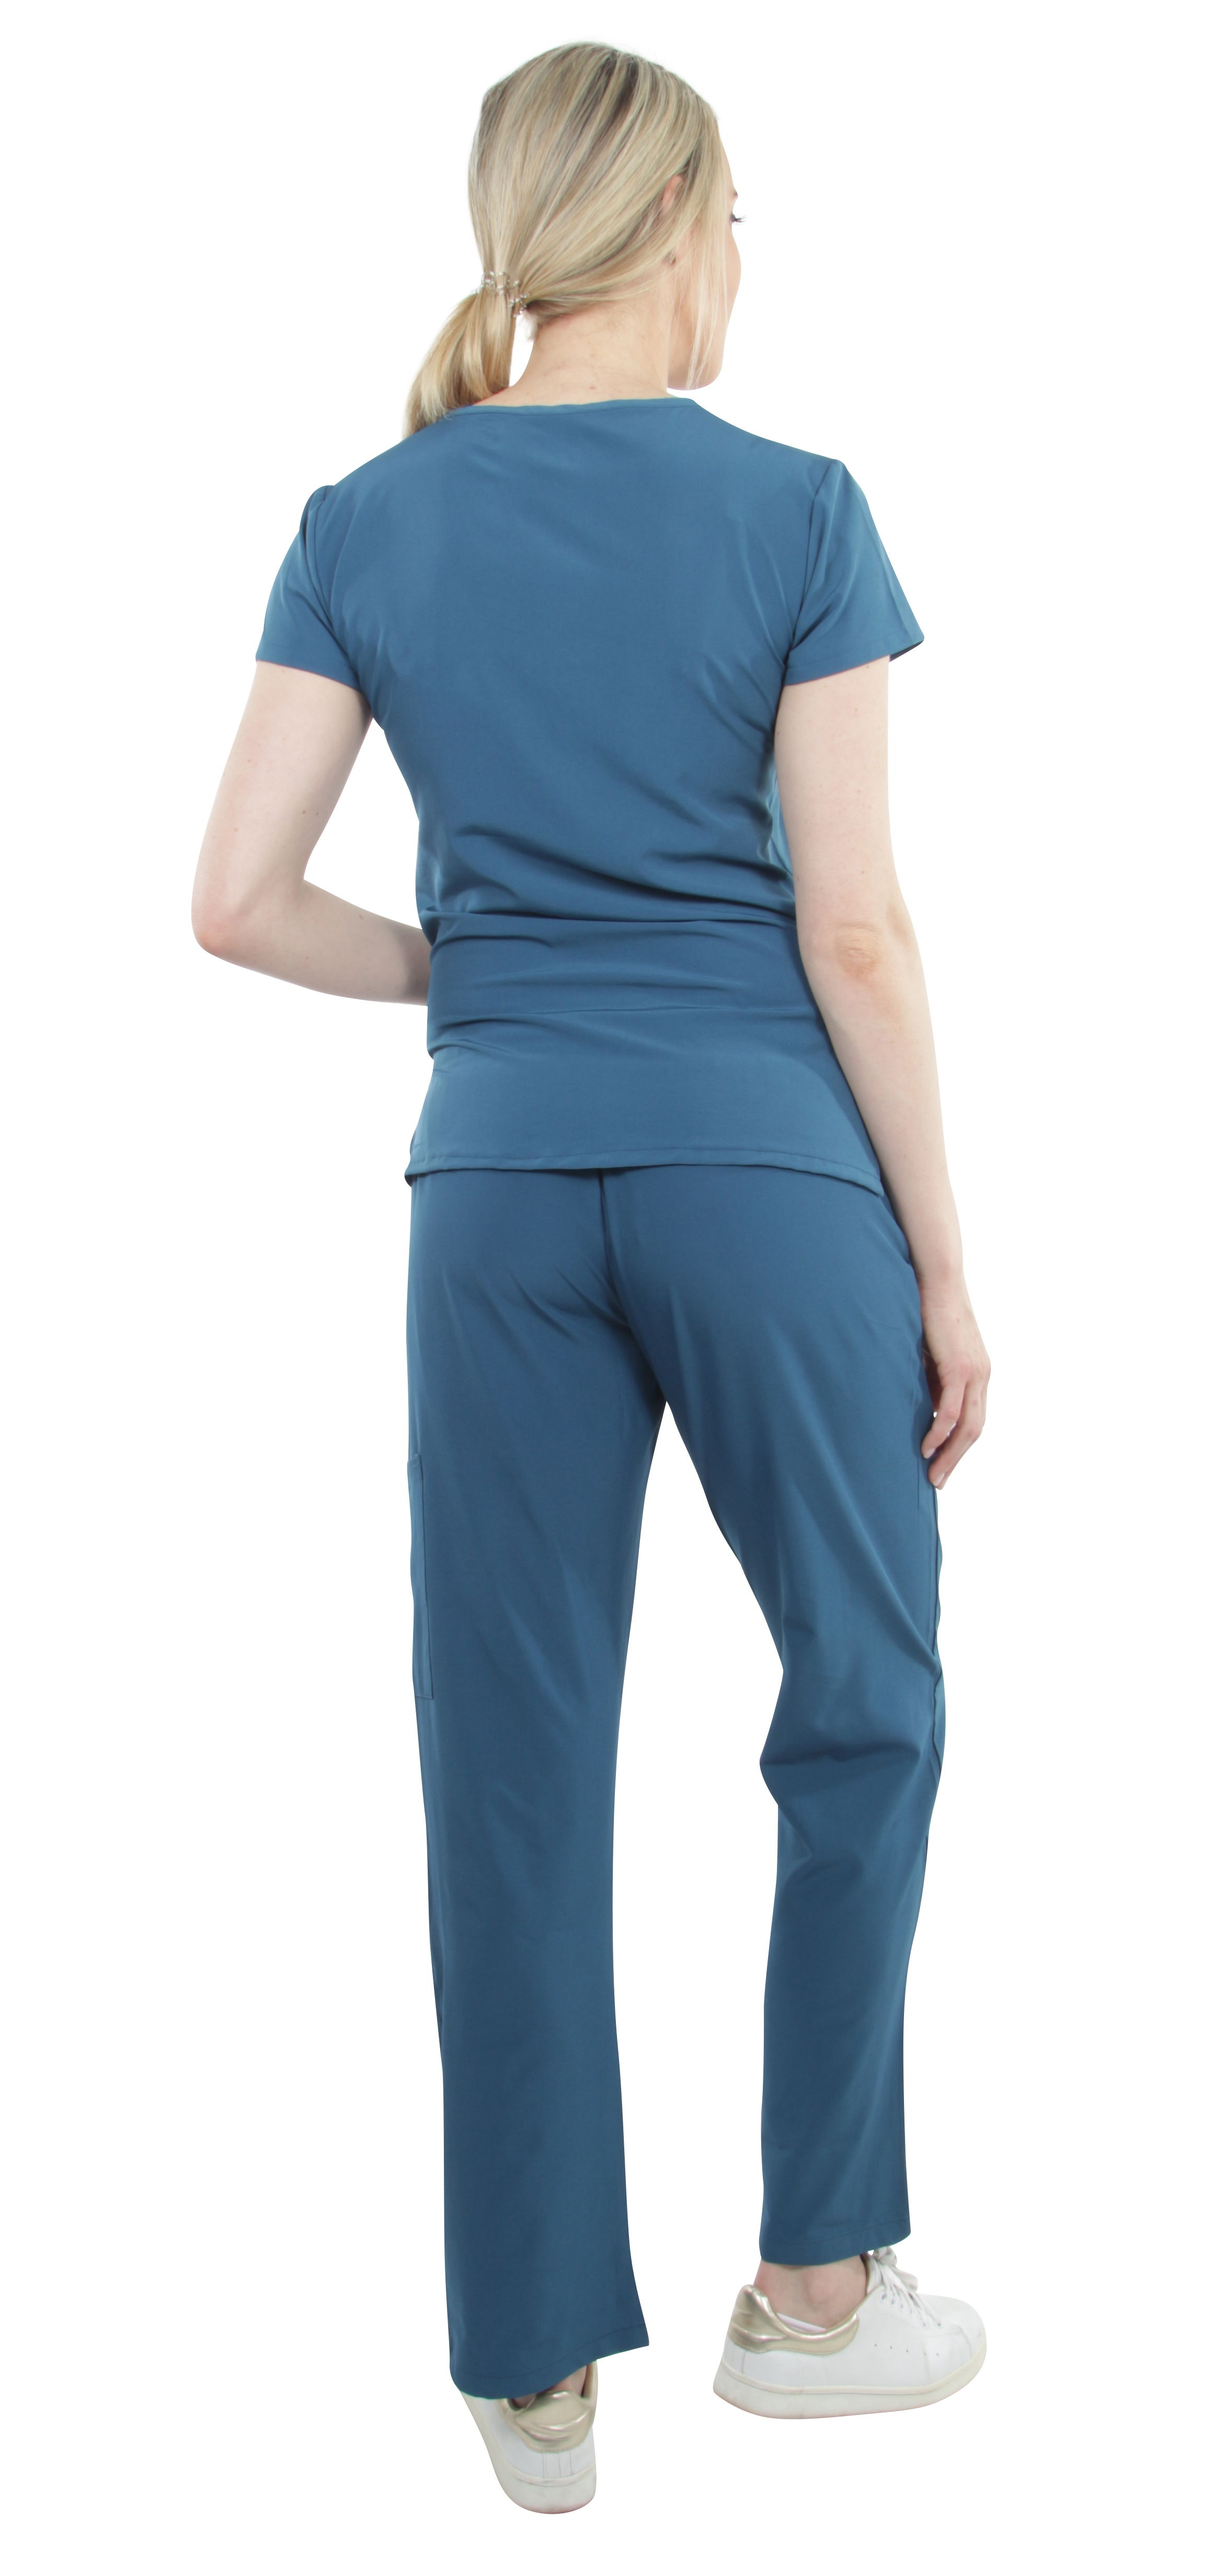 Unisex-Performance-Stretch-Medical-Uniform-Five-Pockets-V-Neck-Scrubs-Sets thumbnail 21